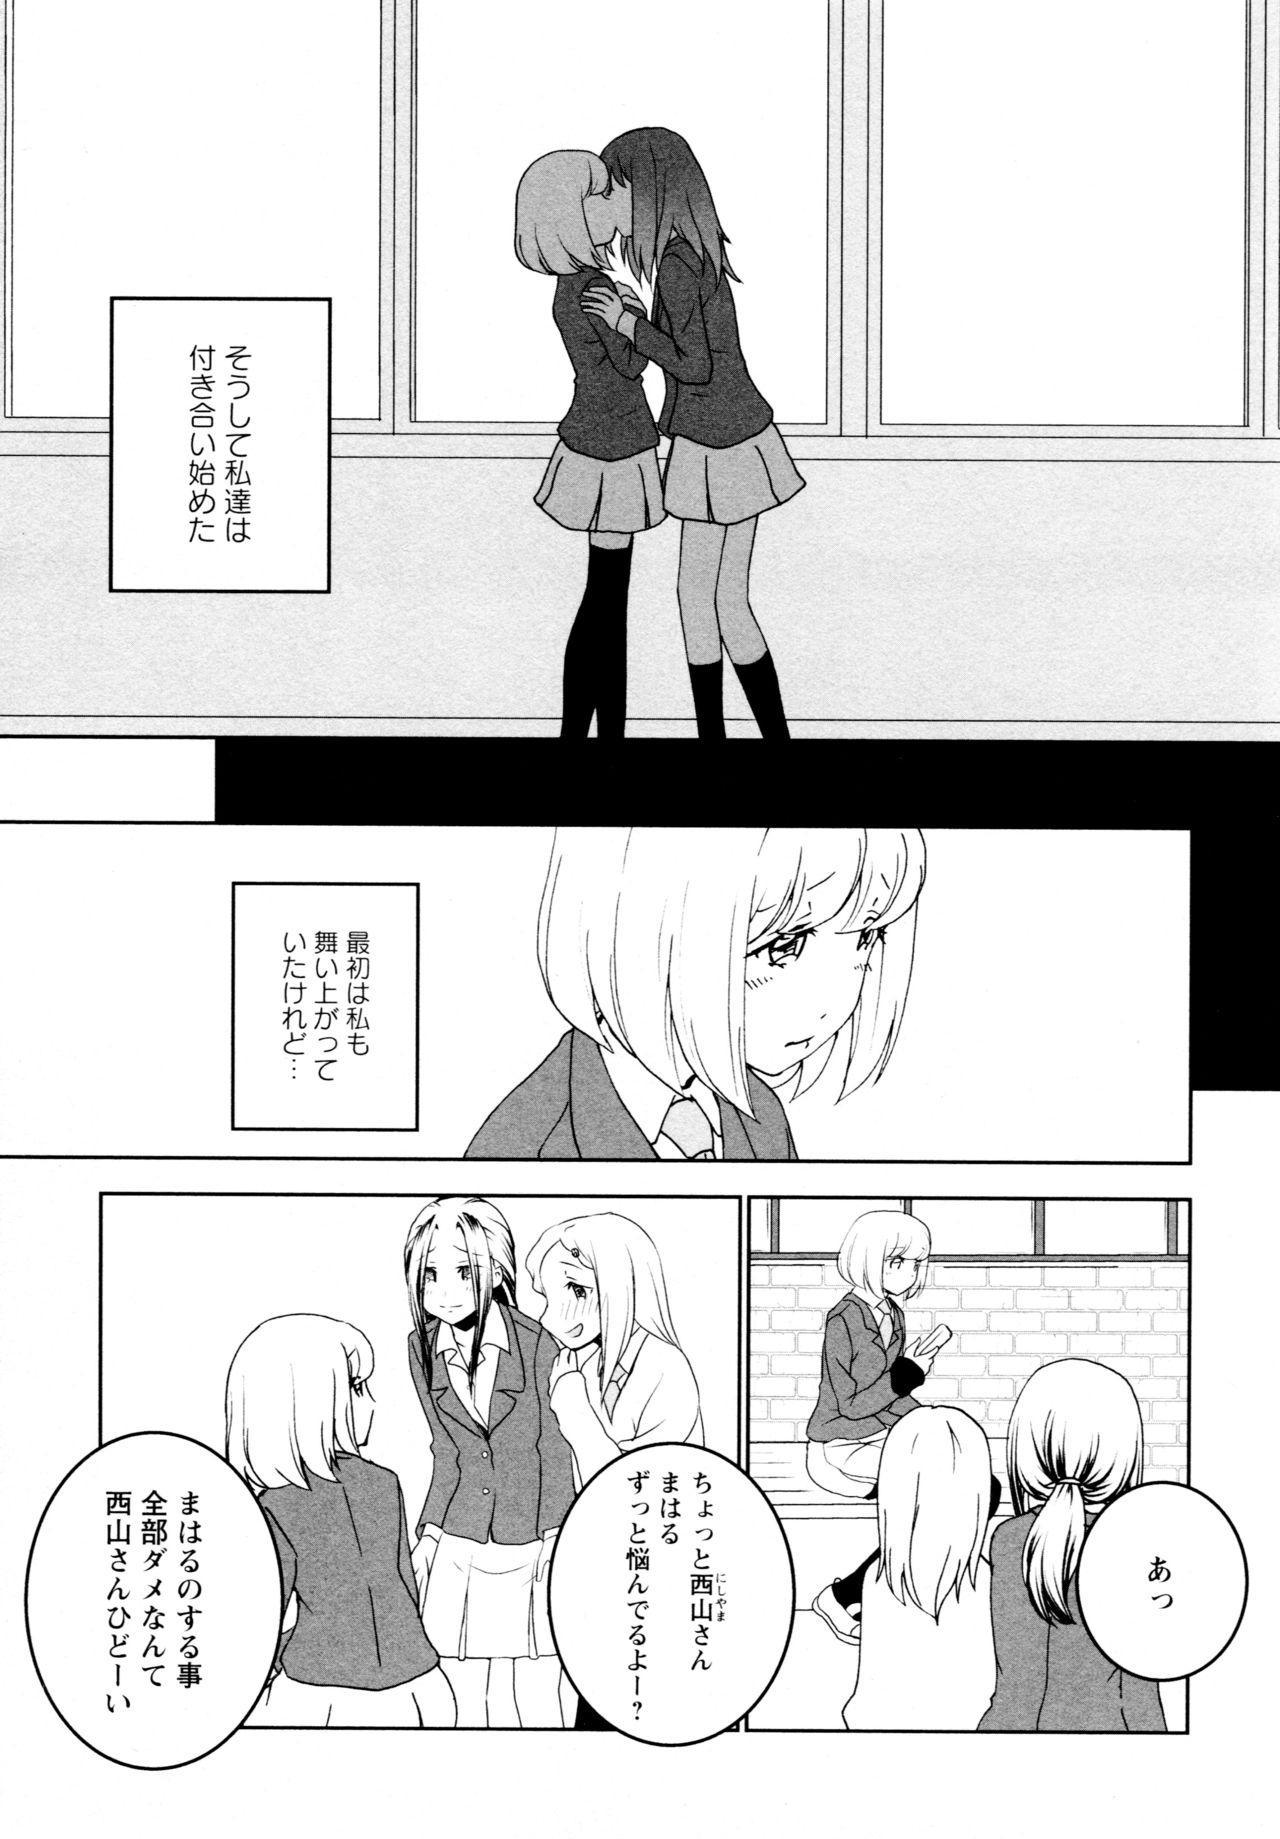 [Anthology] L Girls -Love Girls- 04 11